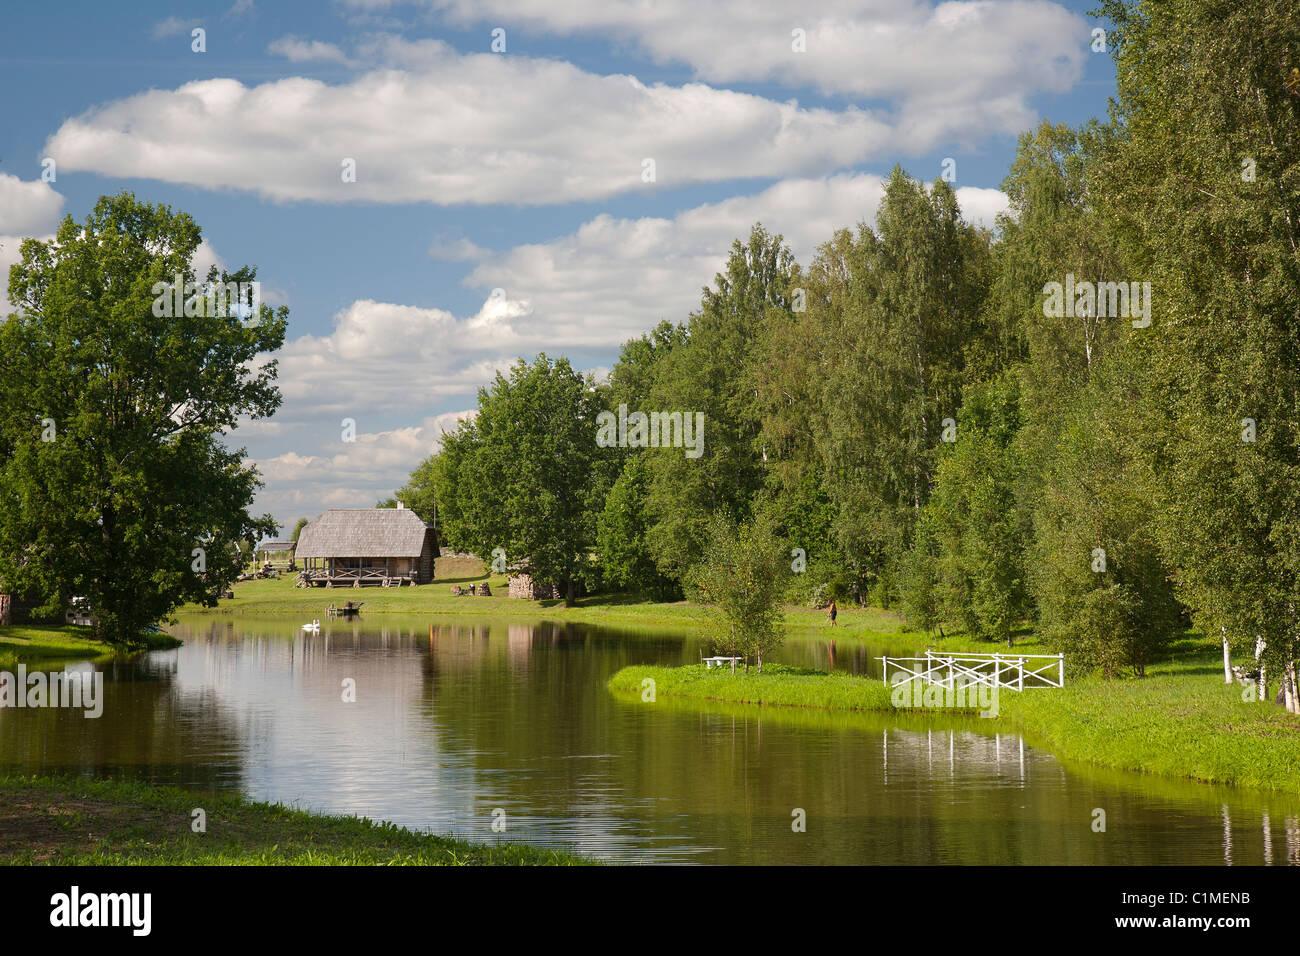 Old Farmstead in Võru County, Estonia - Stock Image